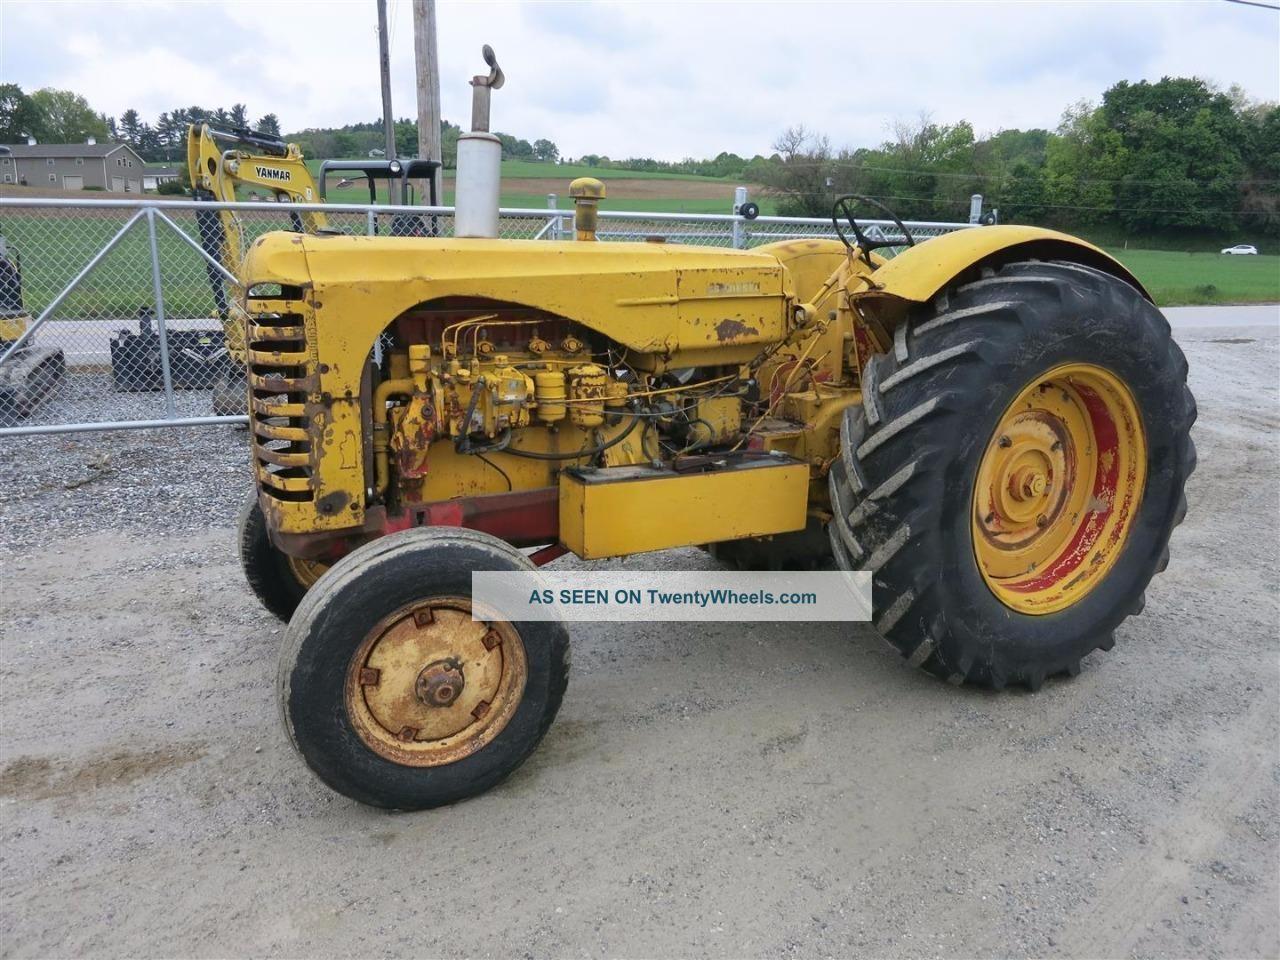 Farm Machinery Belts : Massey harris tractor wide front hp diesel belt pulley hours